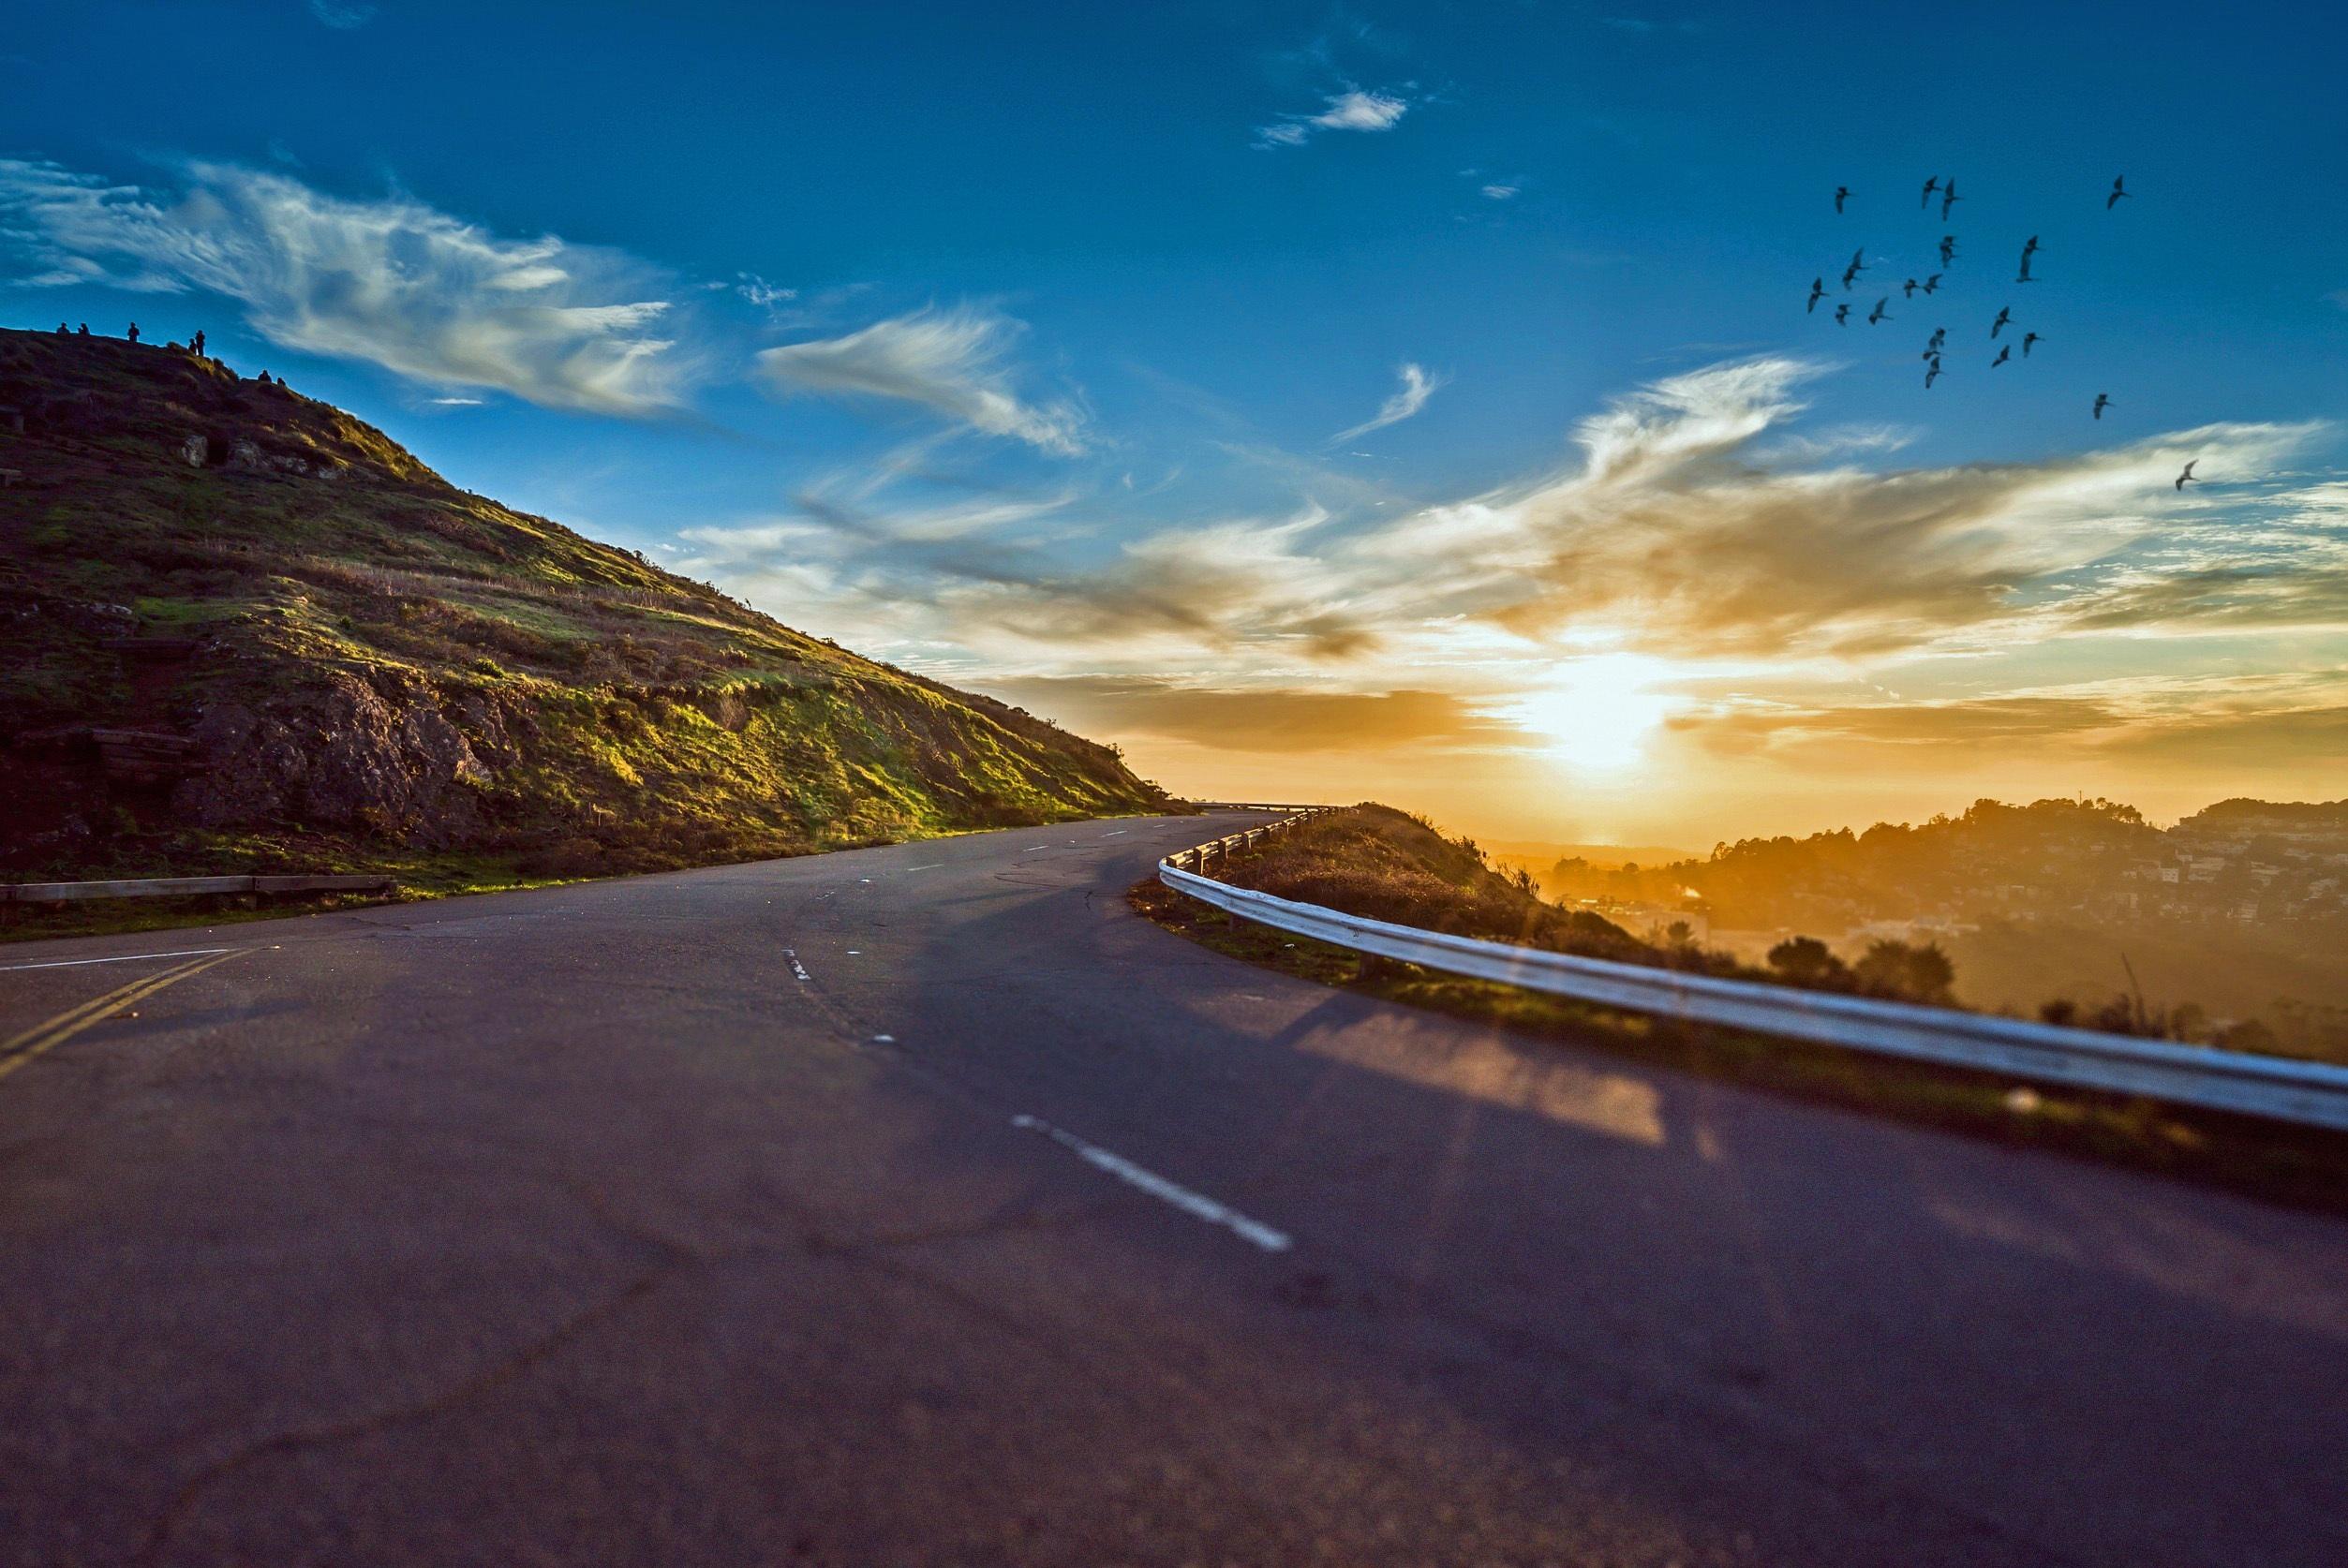 mountain-road-1556177